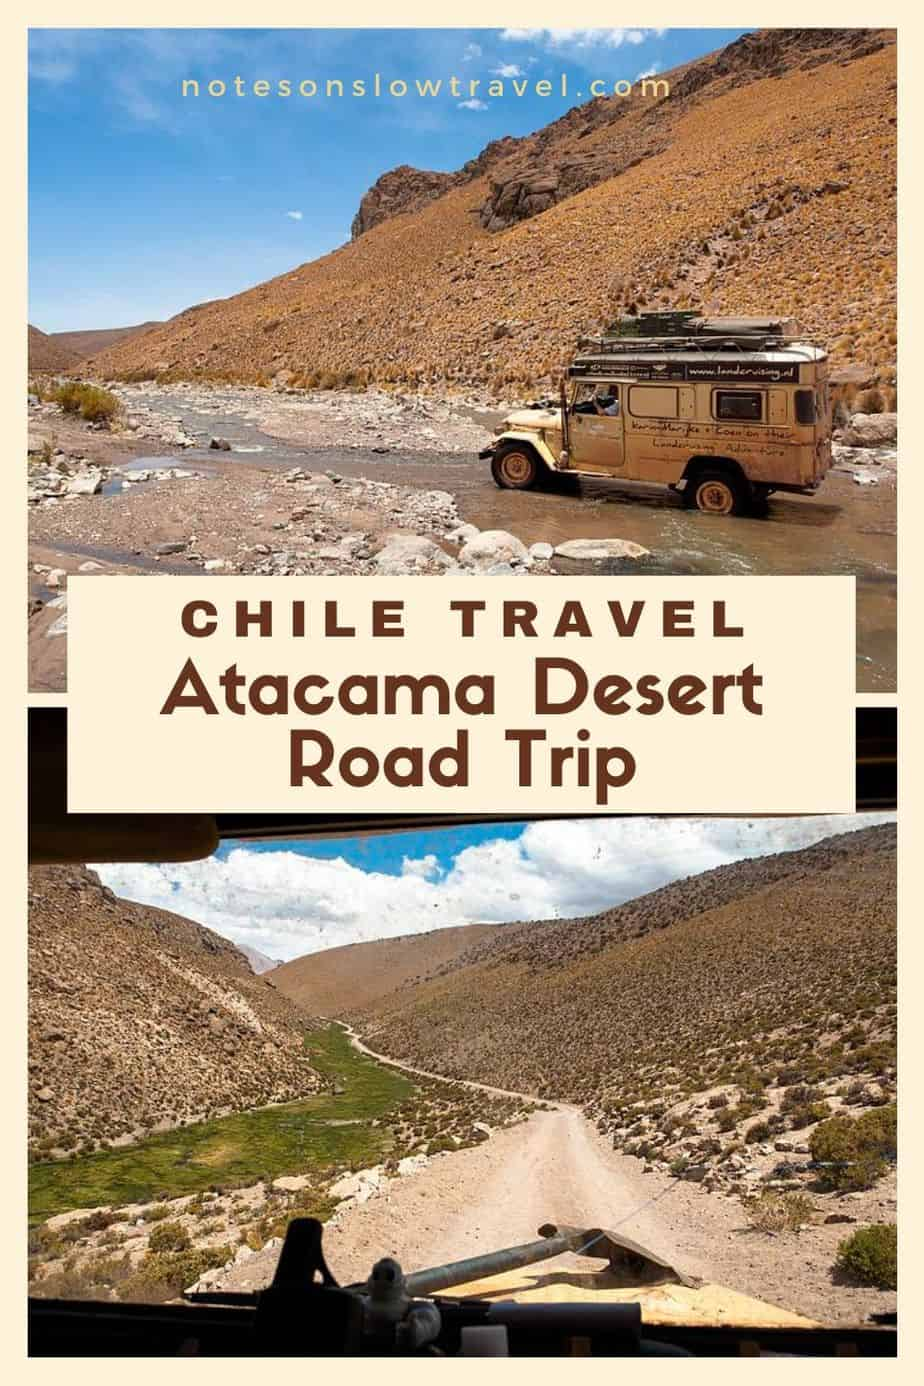 Atacama Desert Road Trip, Chile